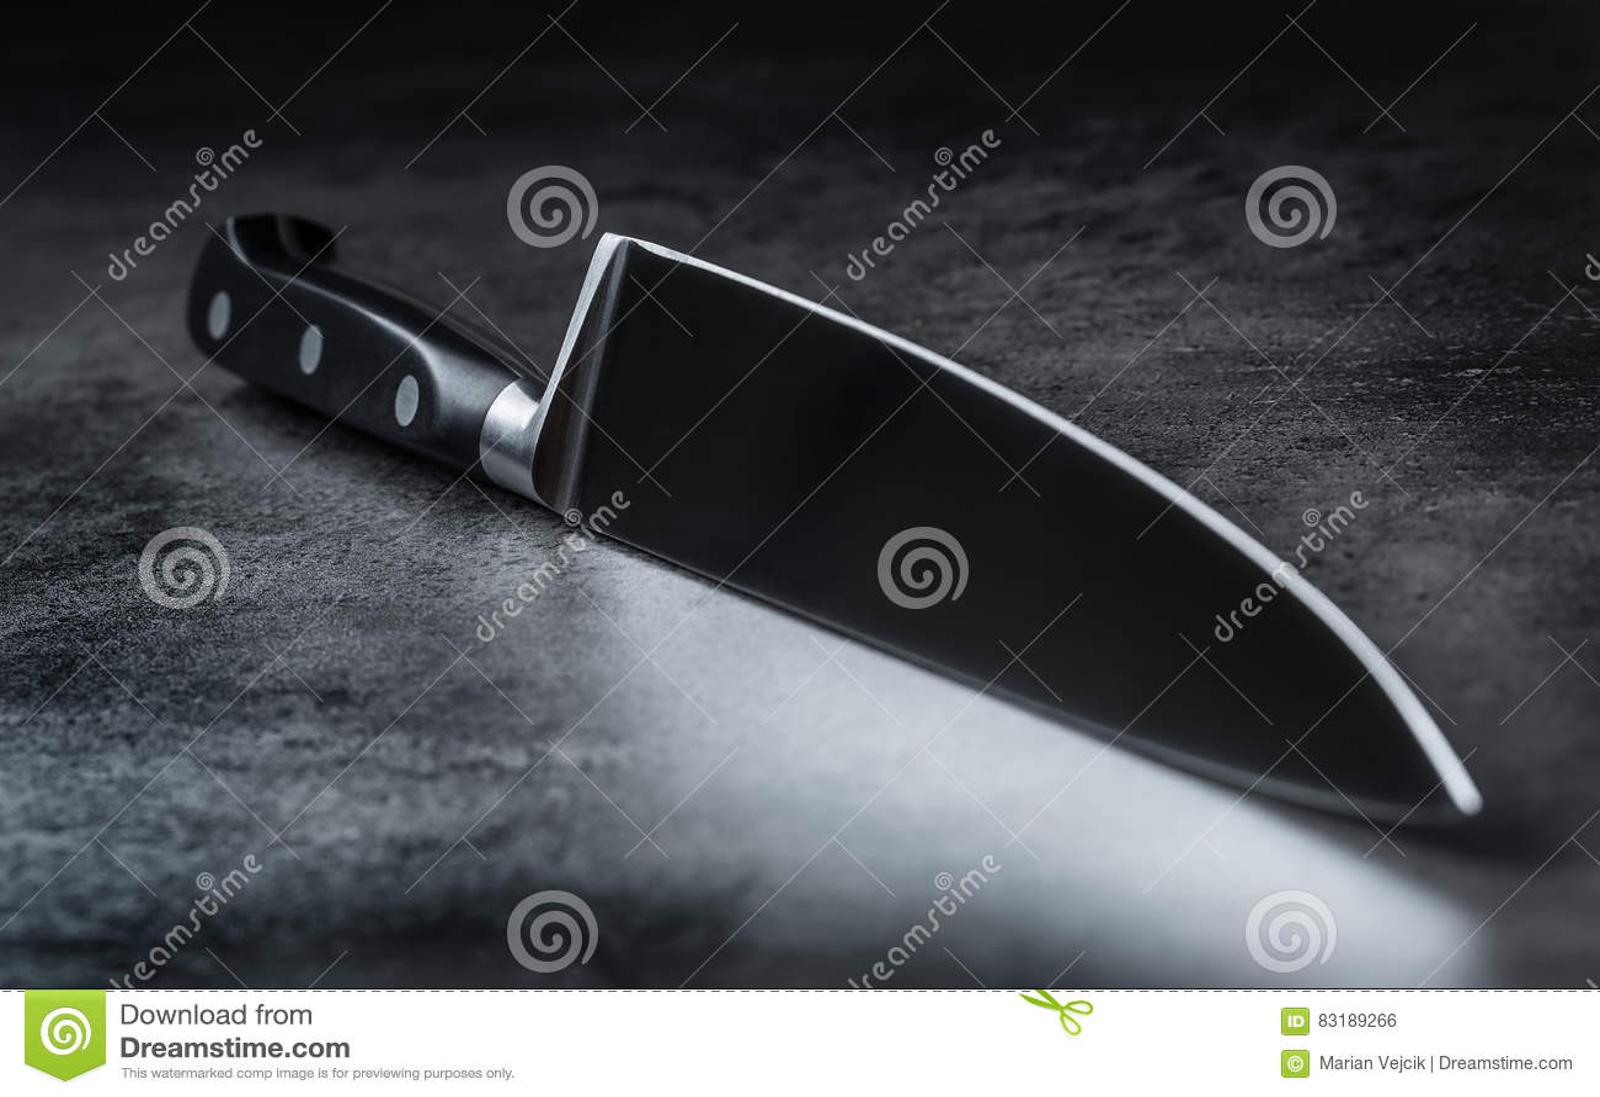 knife kitchen knife lying on an modern concrete cutting board knife kitchen knife lying on an modern concrete cutting board stock photo